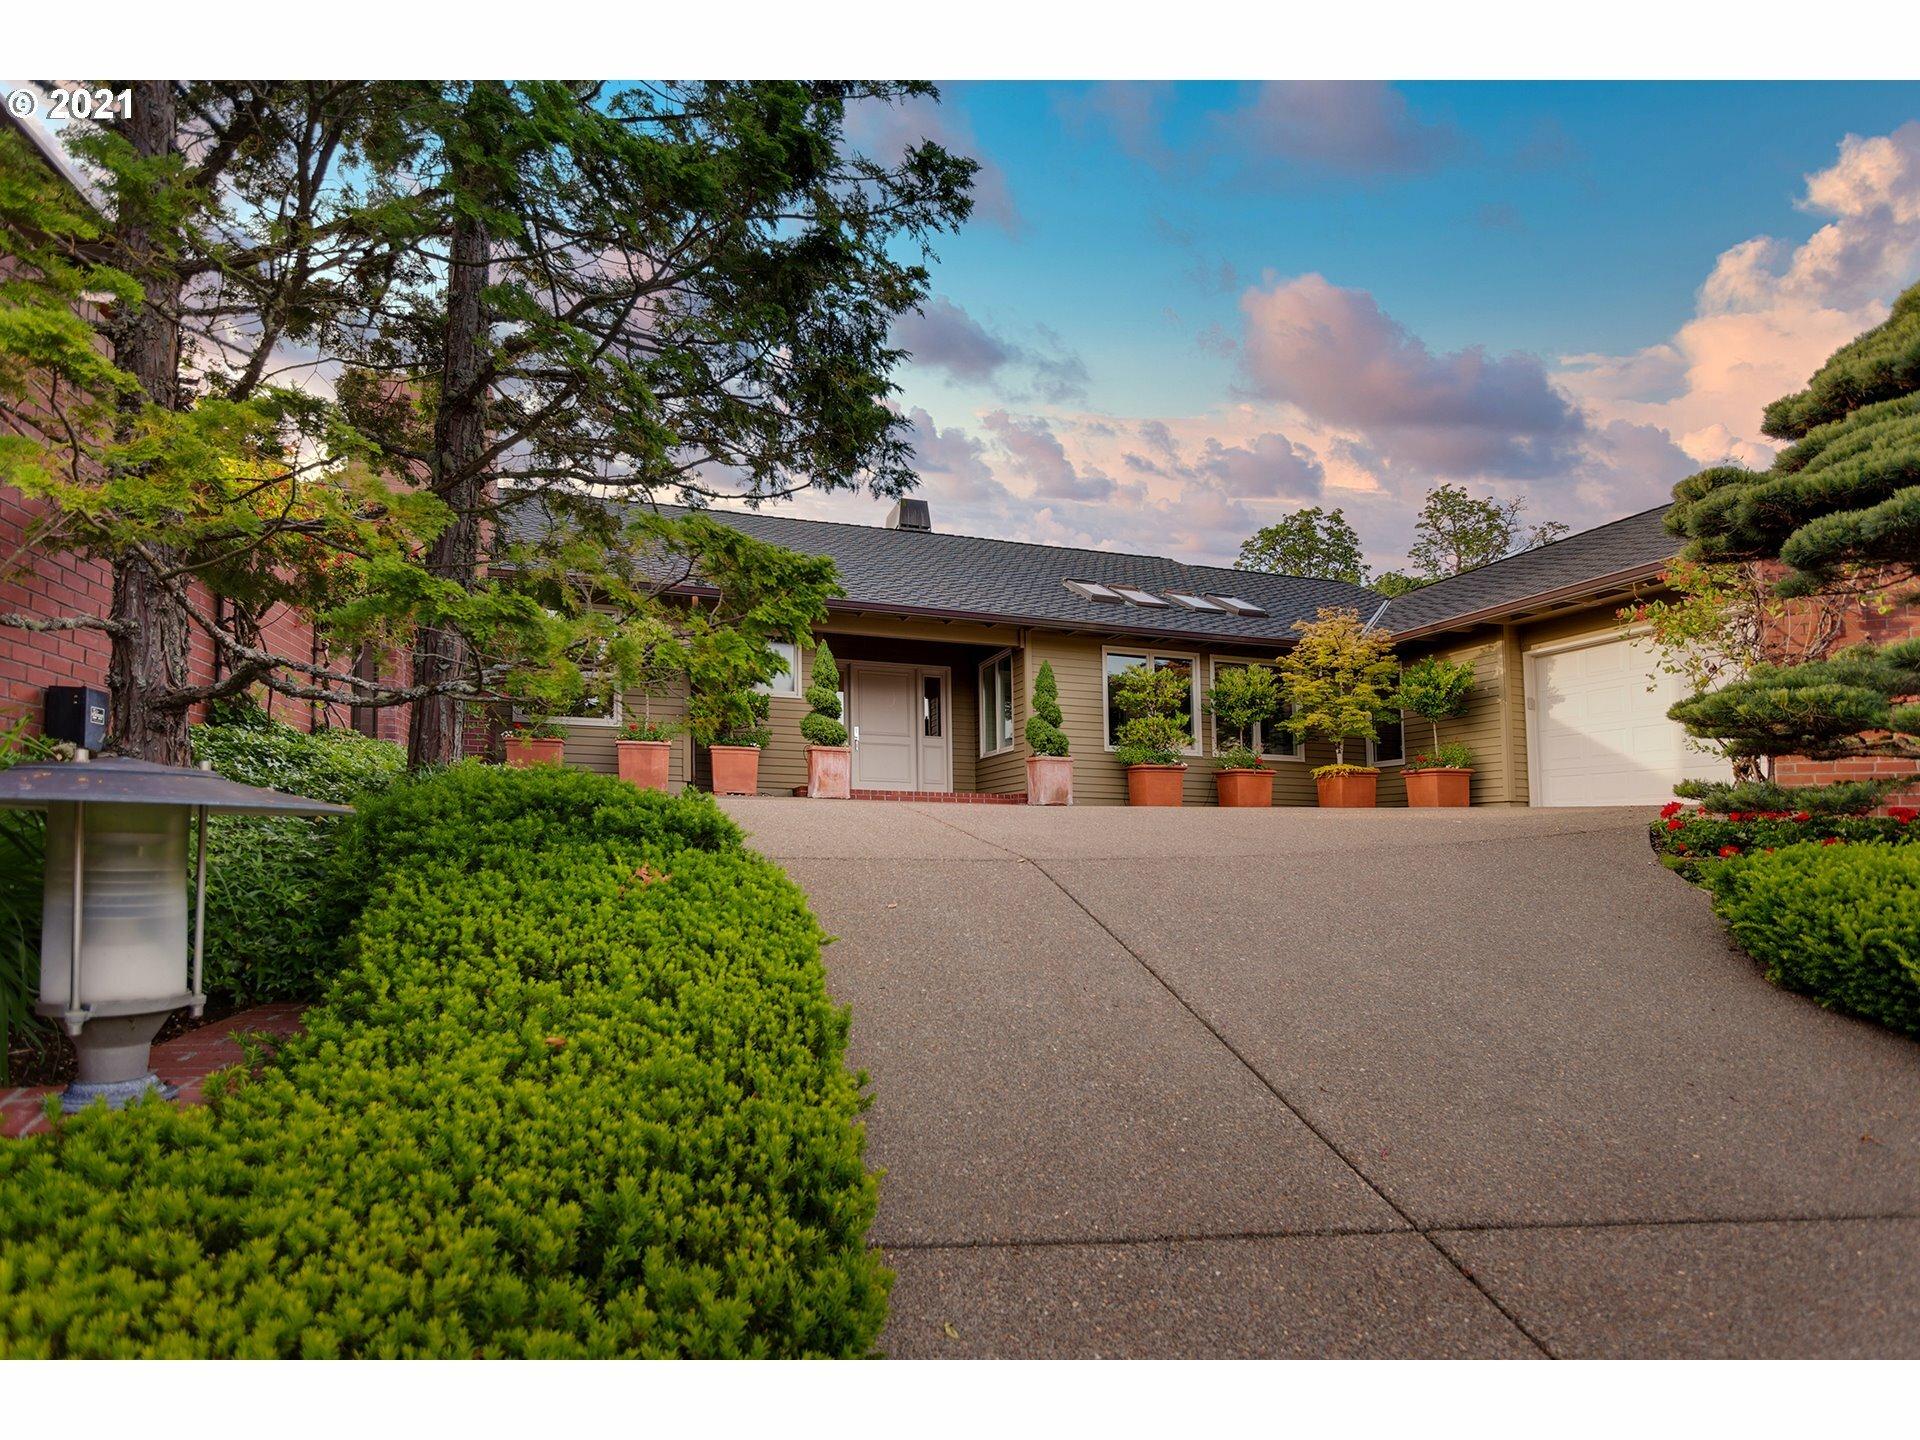 House in Portland, Oregon, United States 1